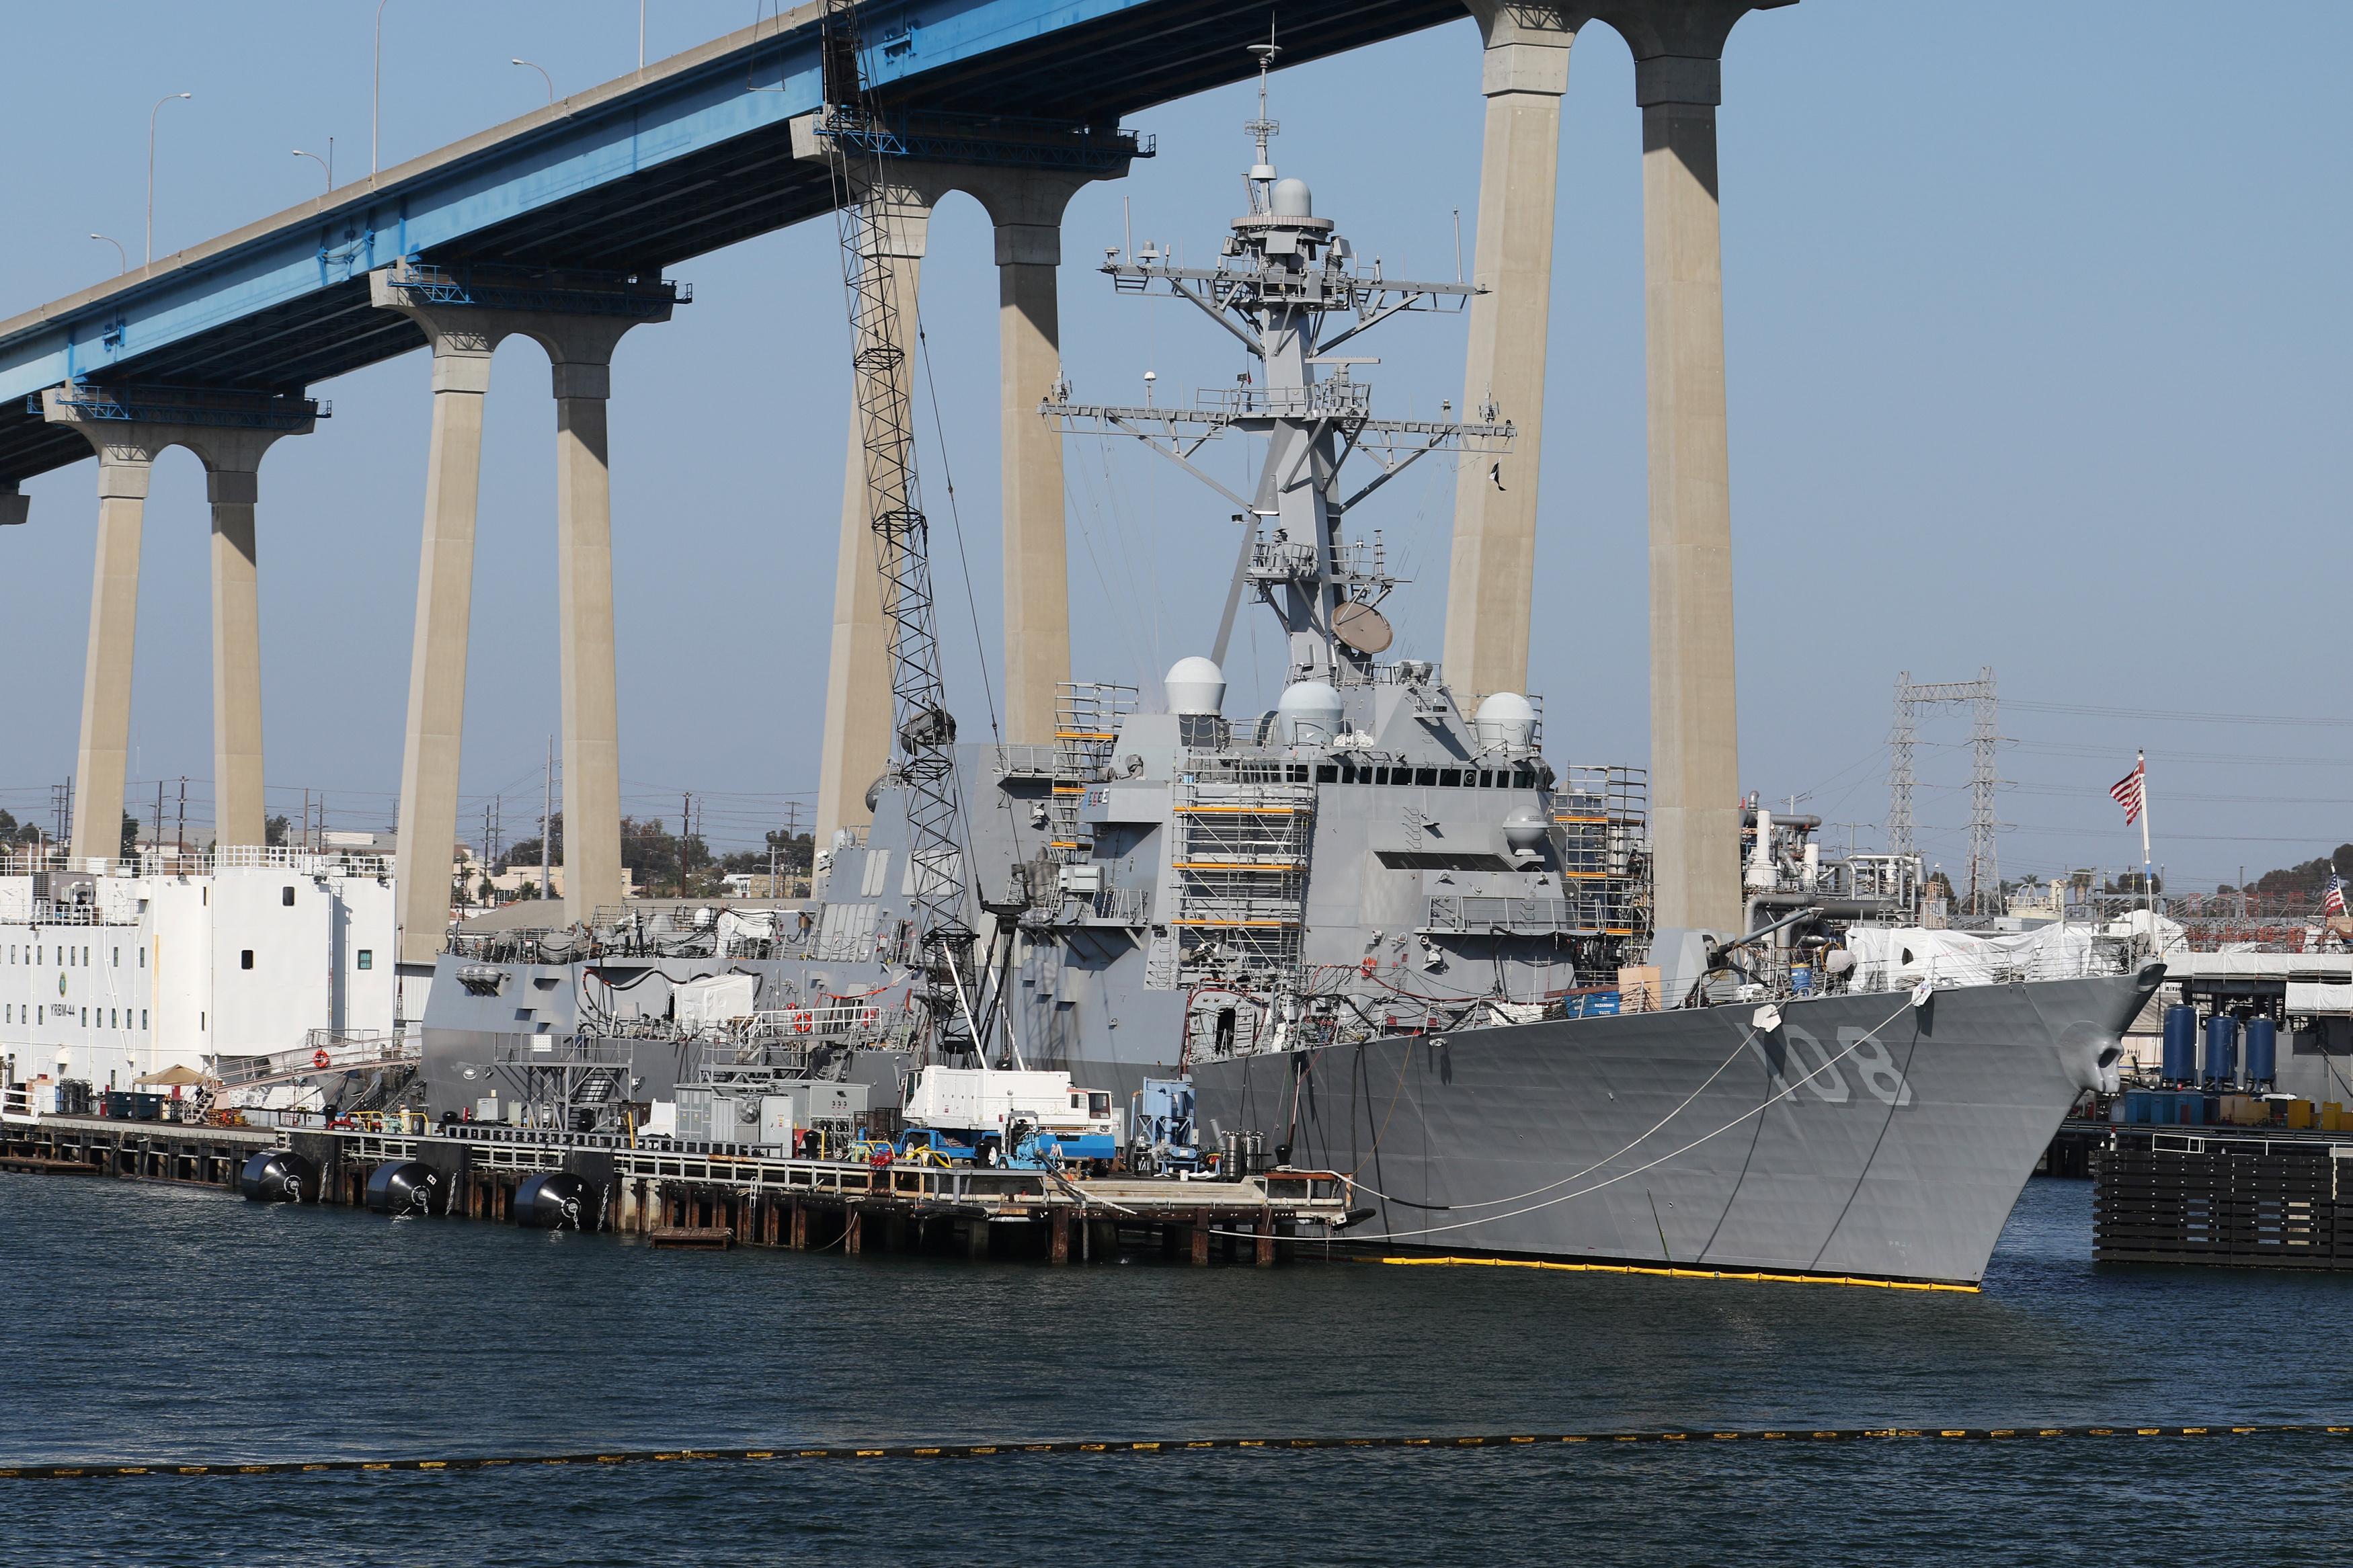 U.S. warship sails near South China Sea islands claimed by China